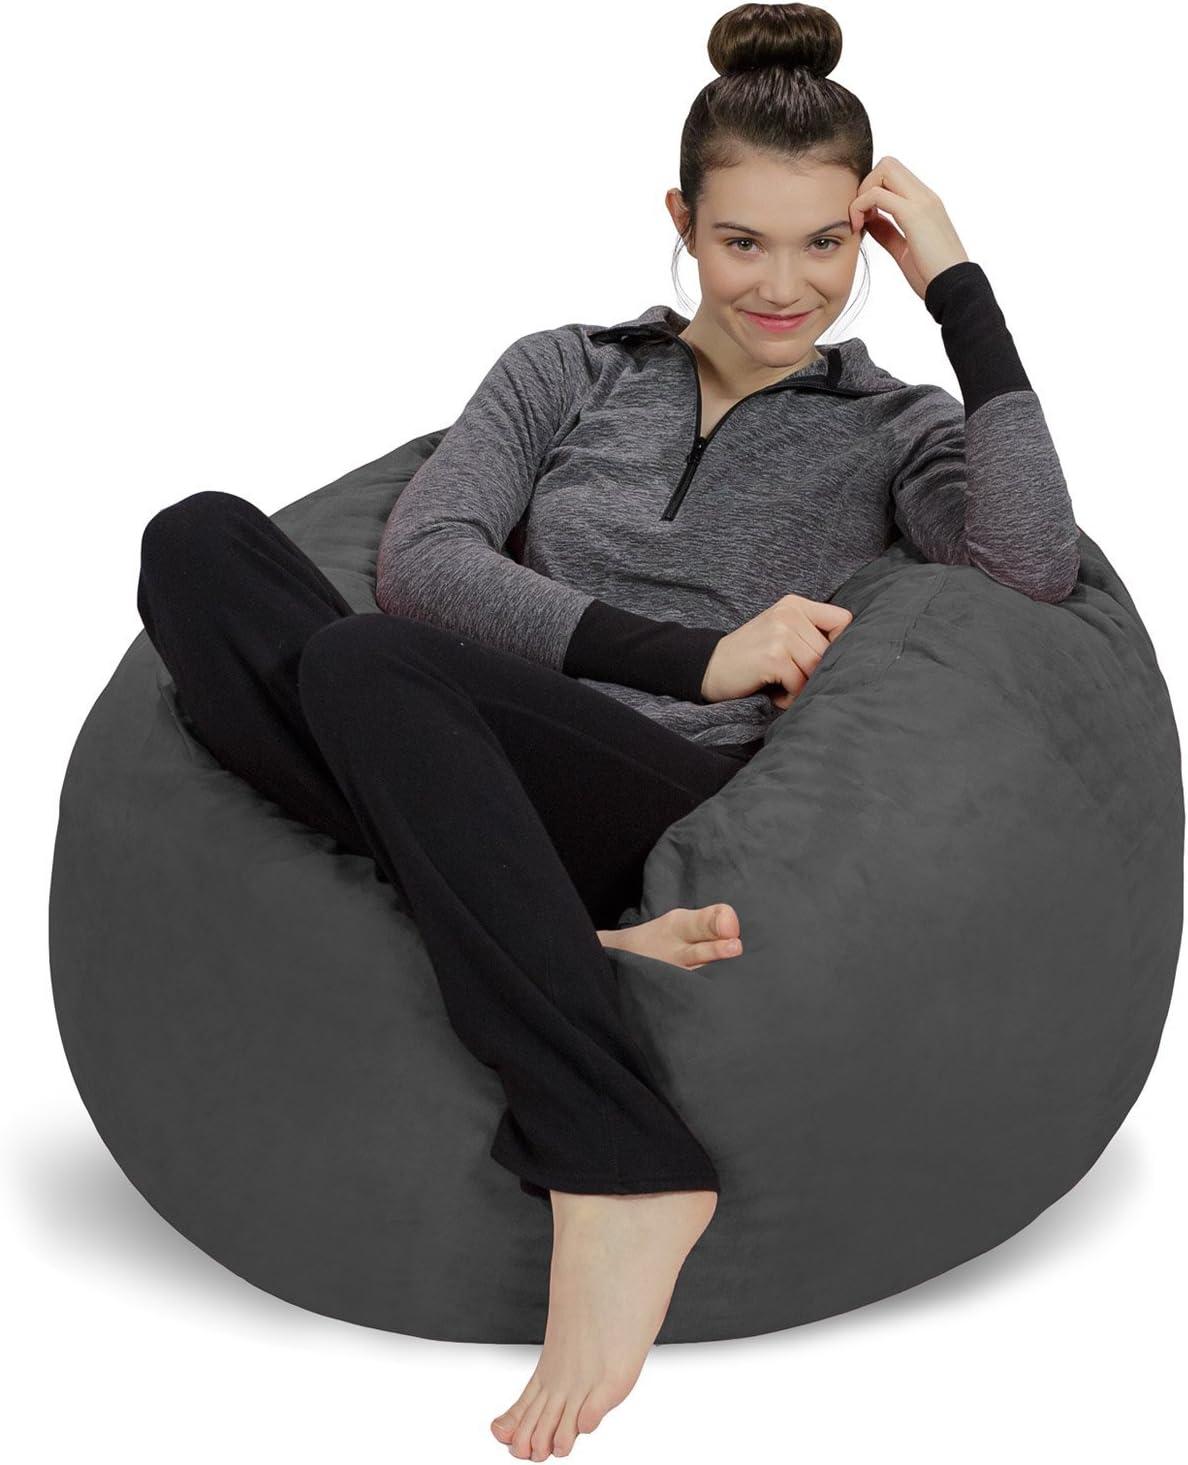 4. Memory Foam Bean Bag Chair